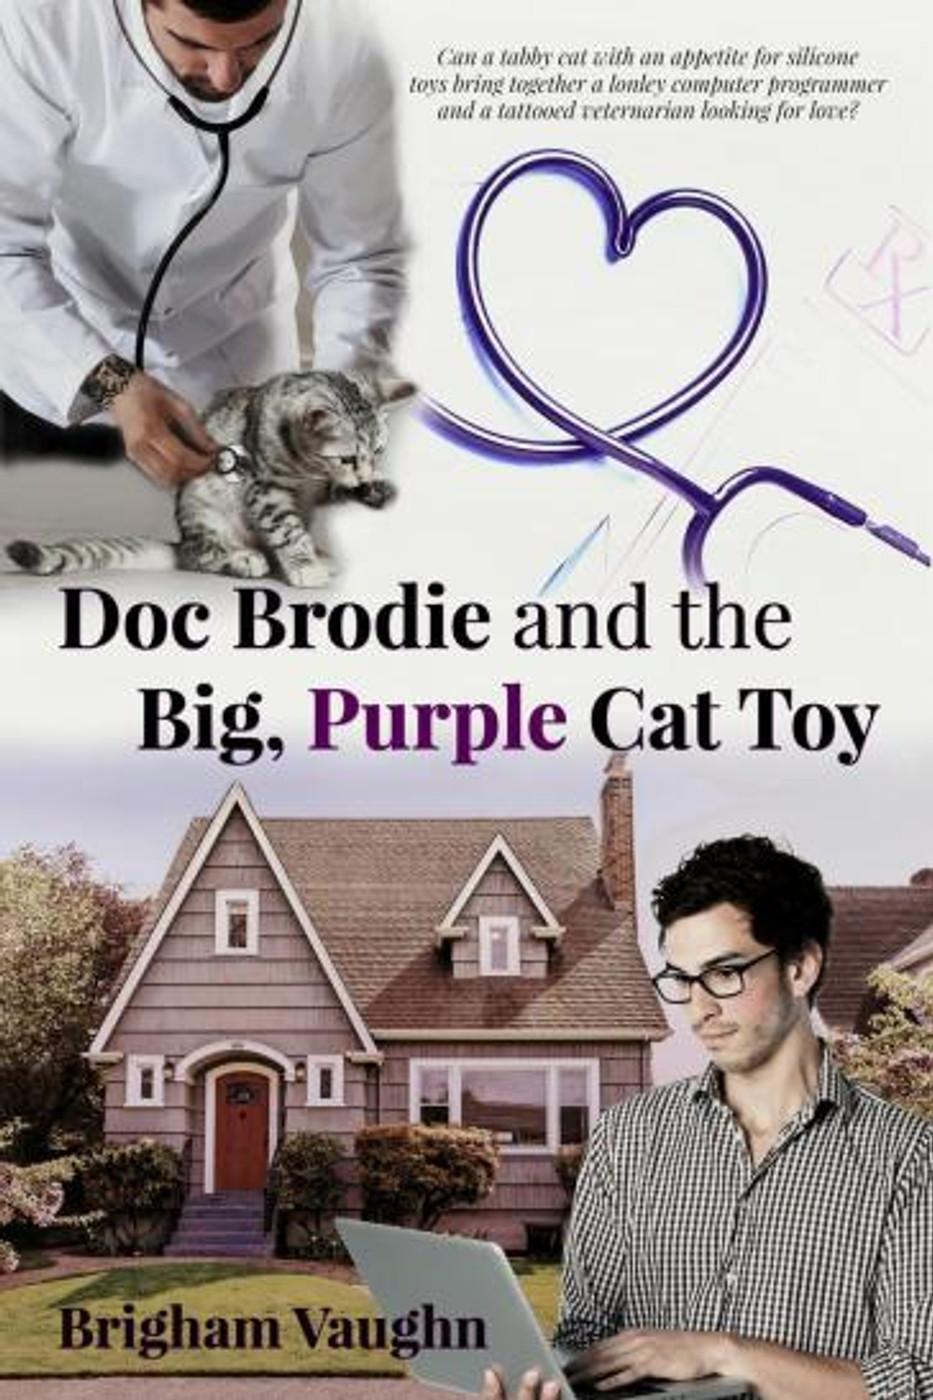 Doc Brodie and the Big, Purple Cat Toy - Brigham Vaughn.jpg